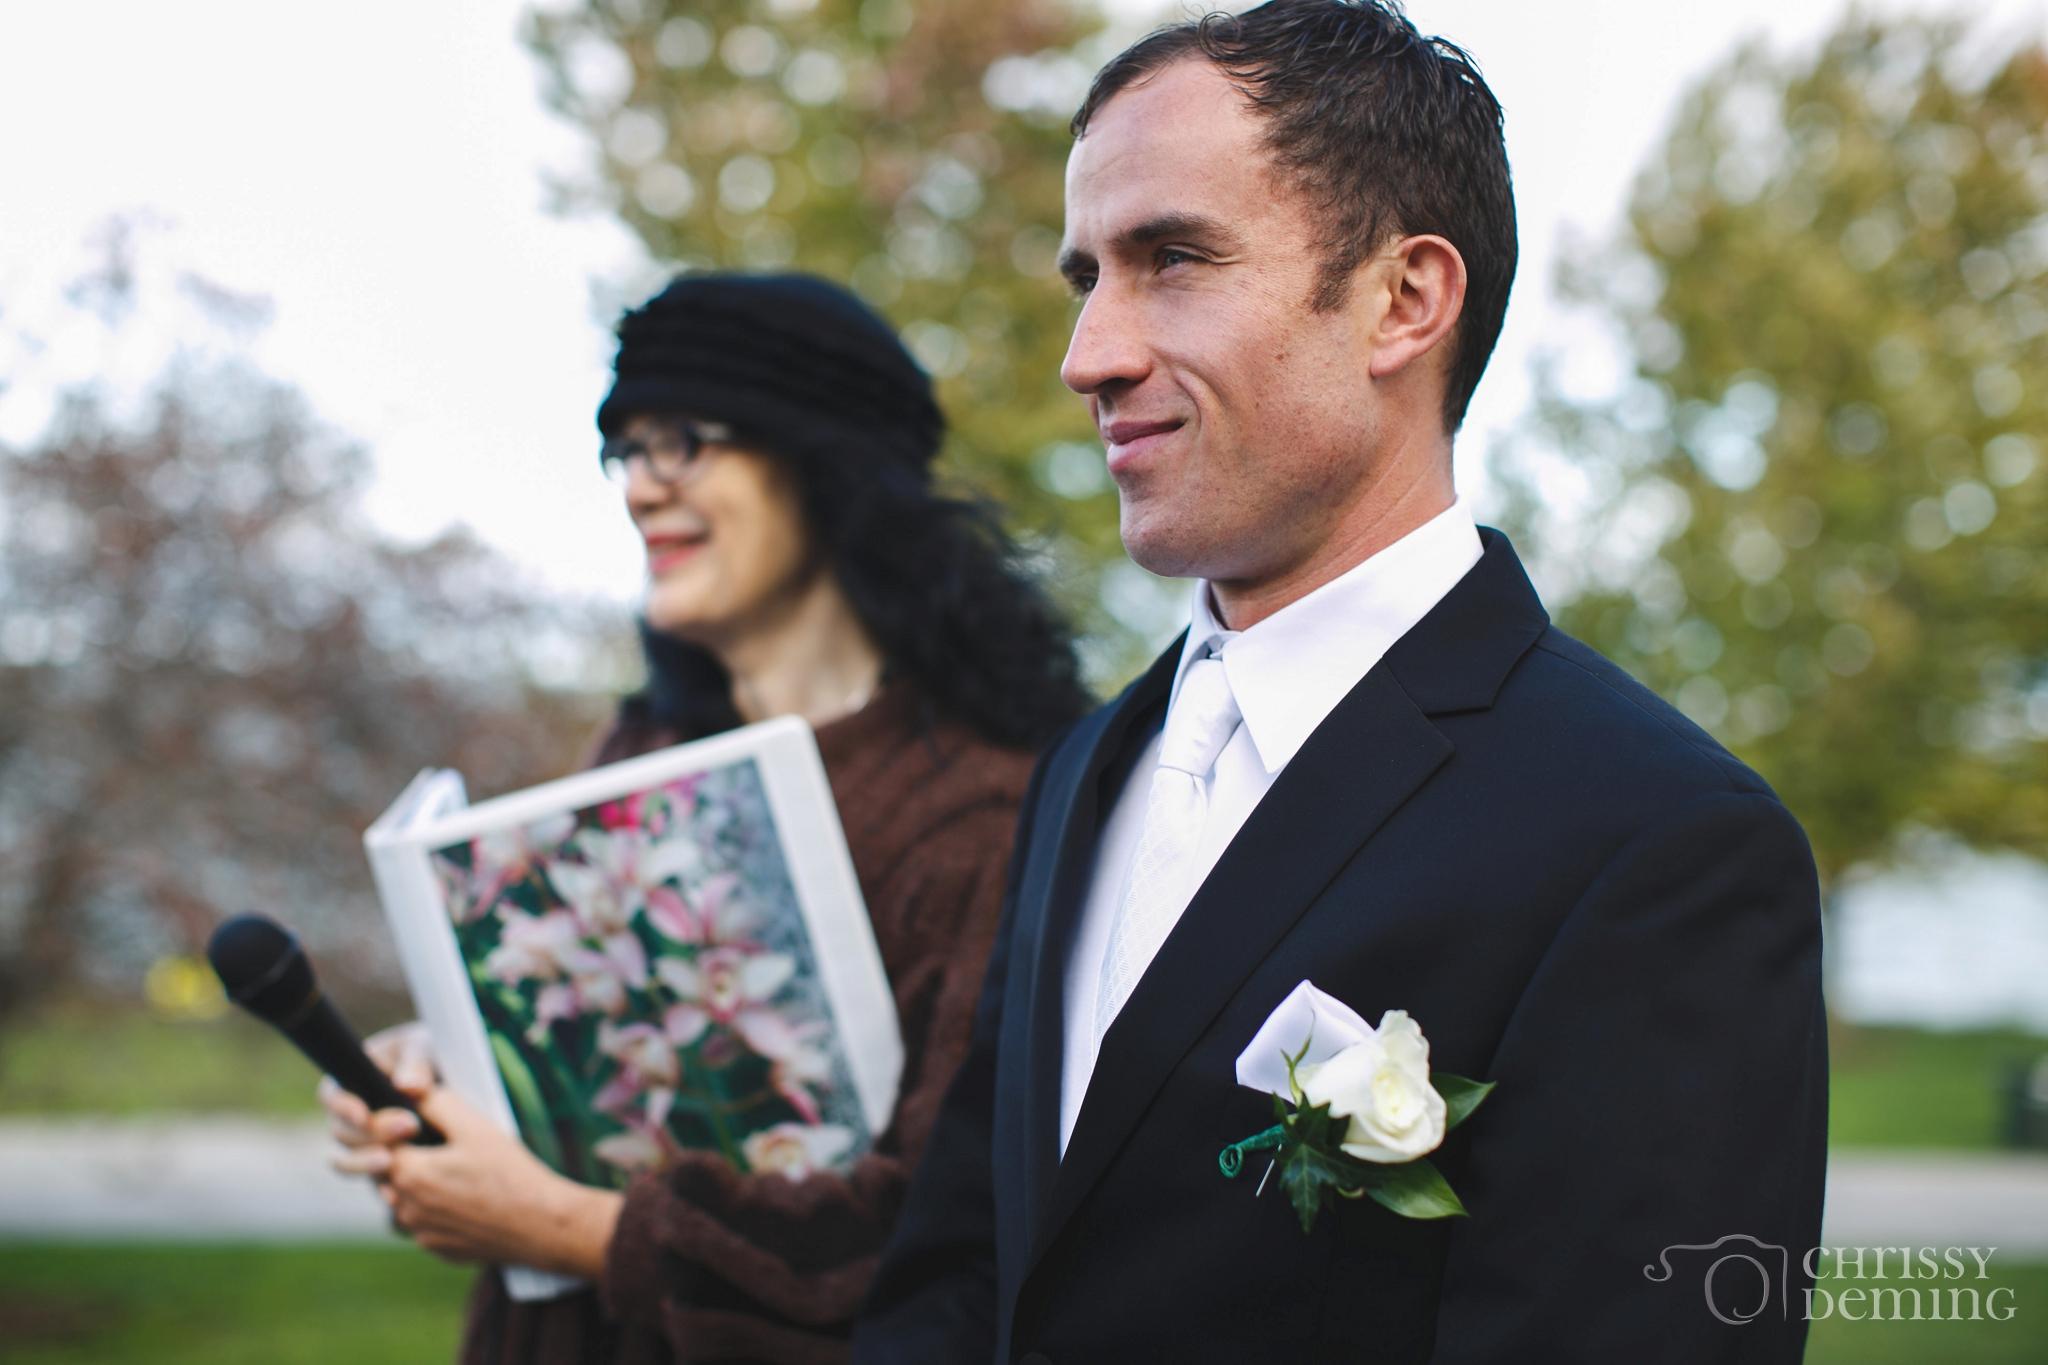 promontory_point_chicago_wedding_photography_0007.jpg